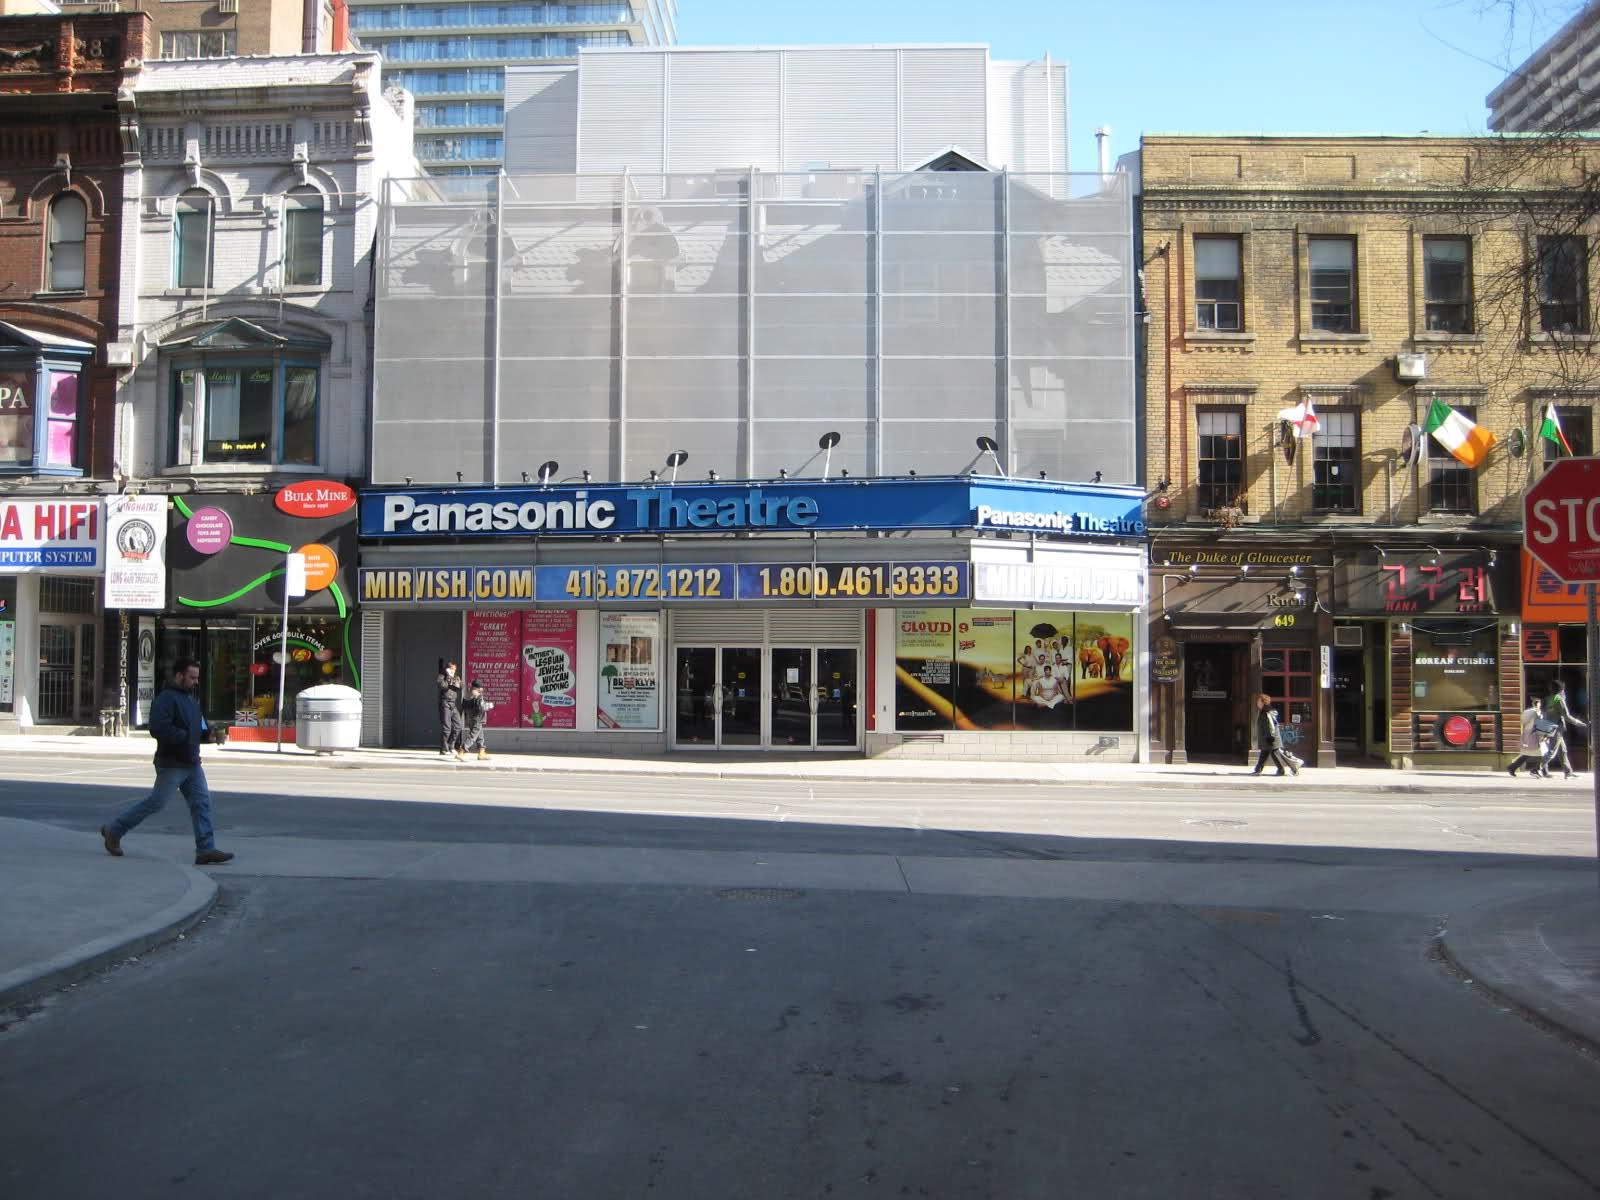 File:Panasonic Theatre Toronto 2010.jpg